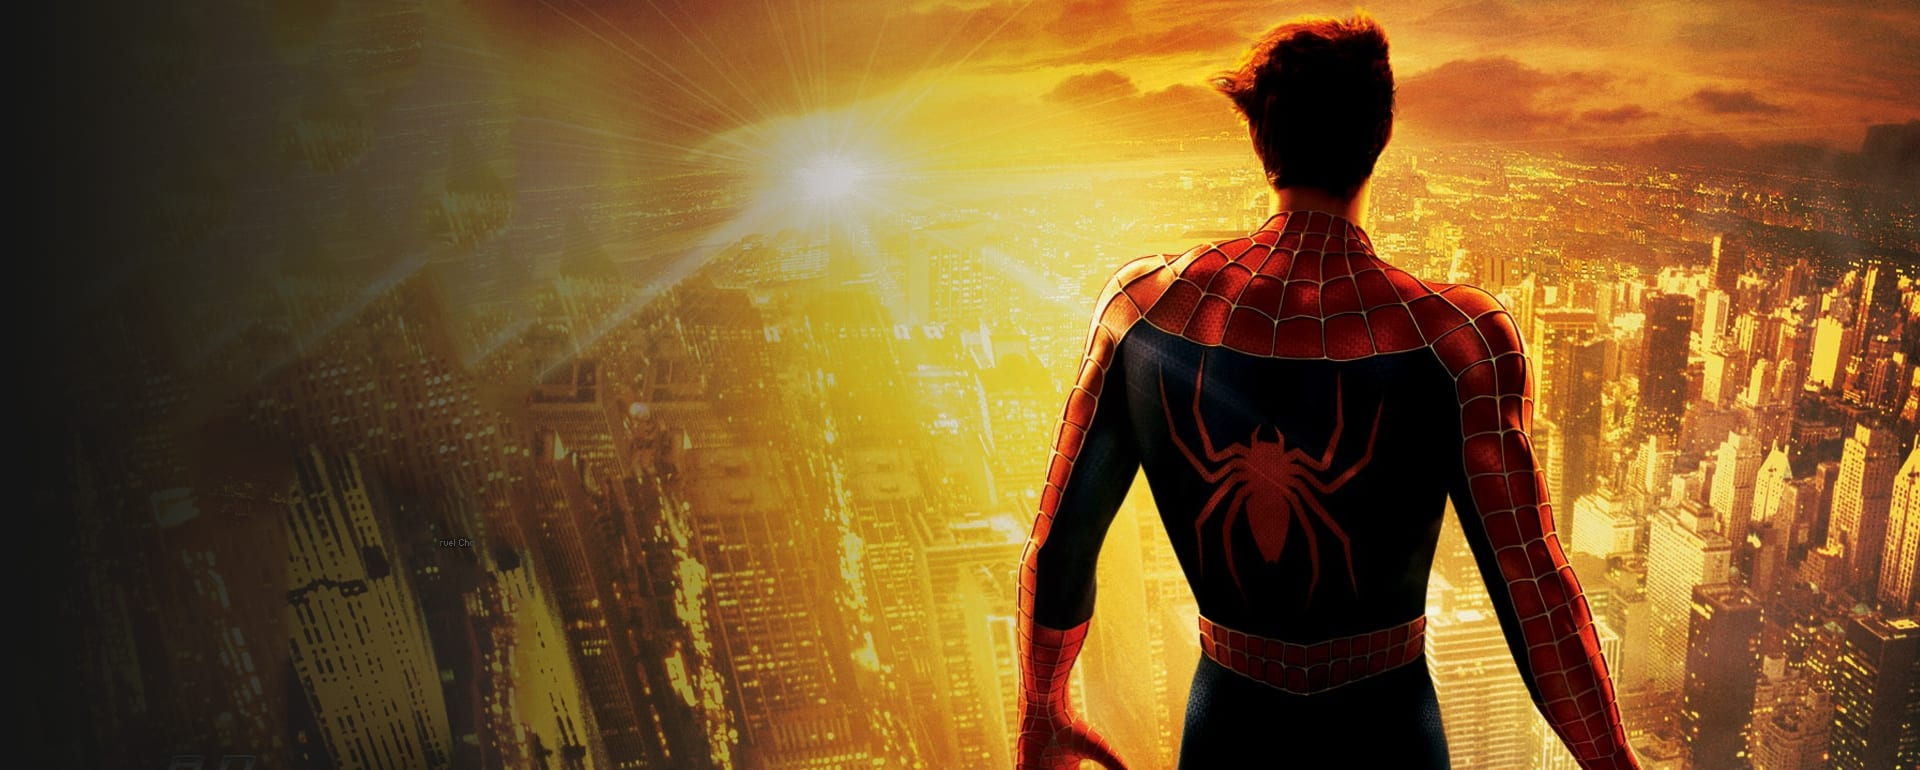 Spider Man 2 Full Movie English